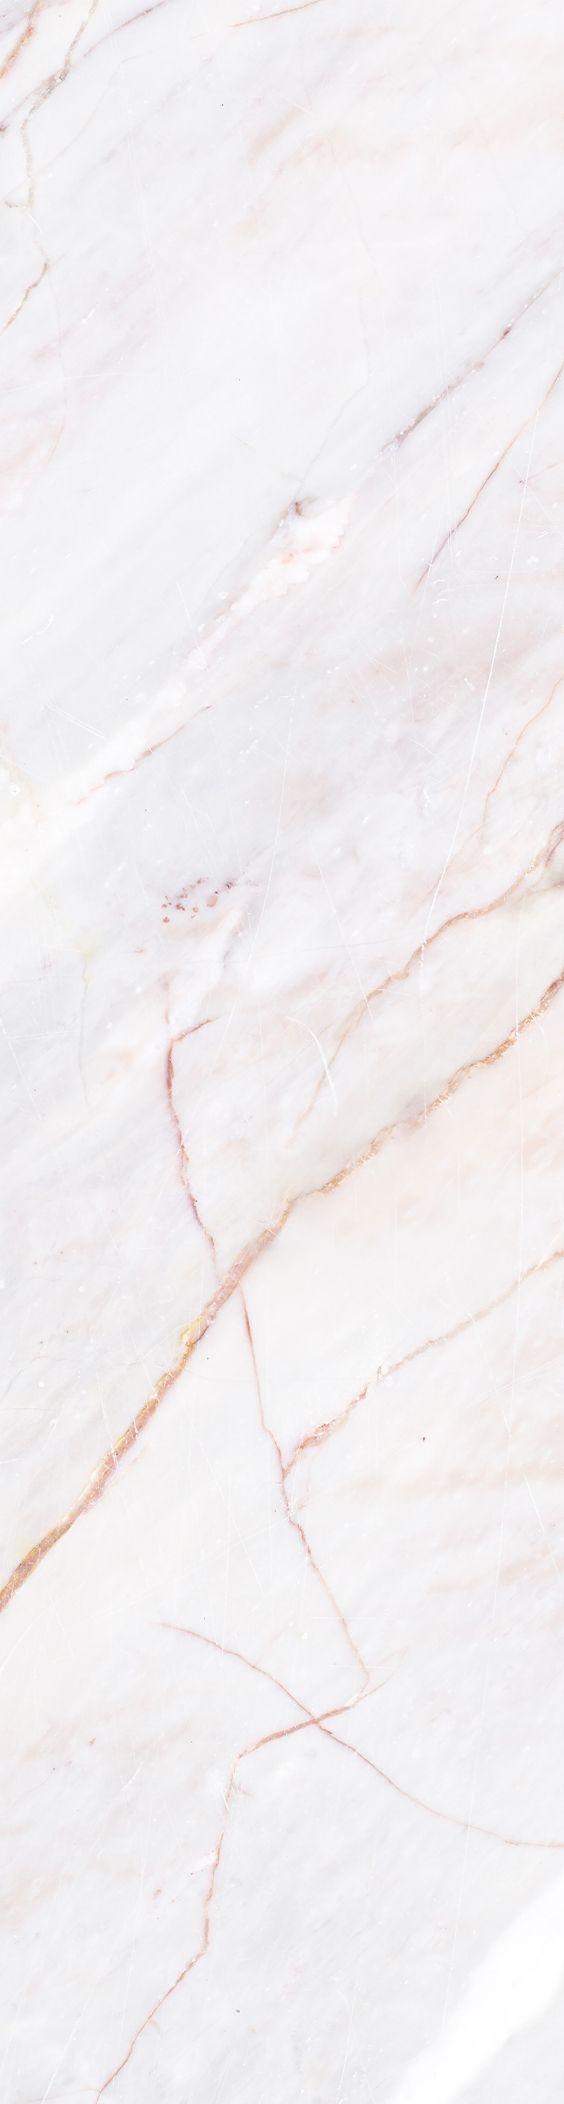 Fototapete Gerissenes Natürliches Marmor | Hovia DE